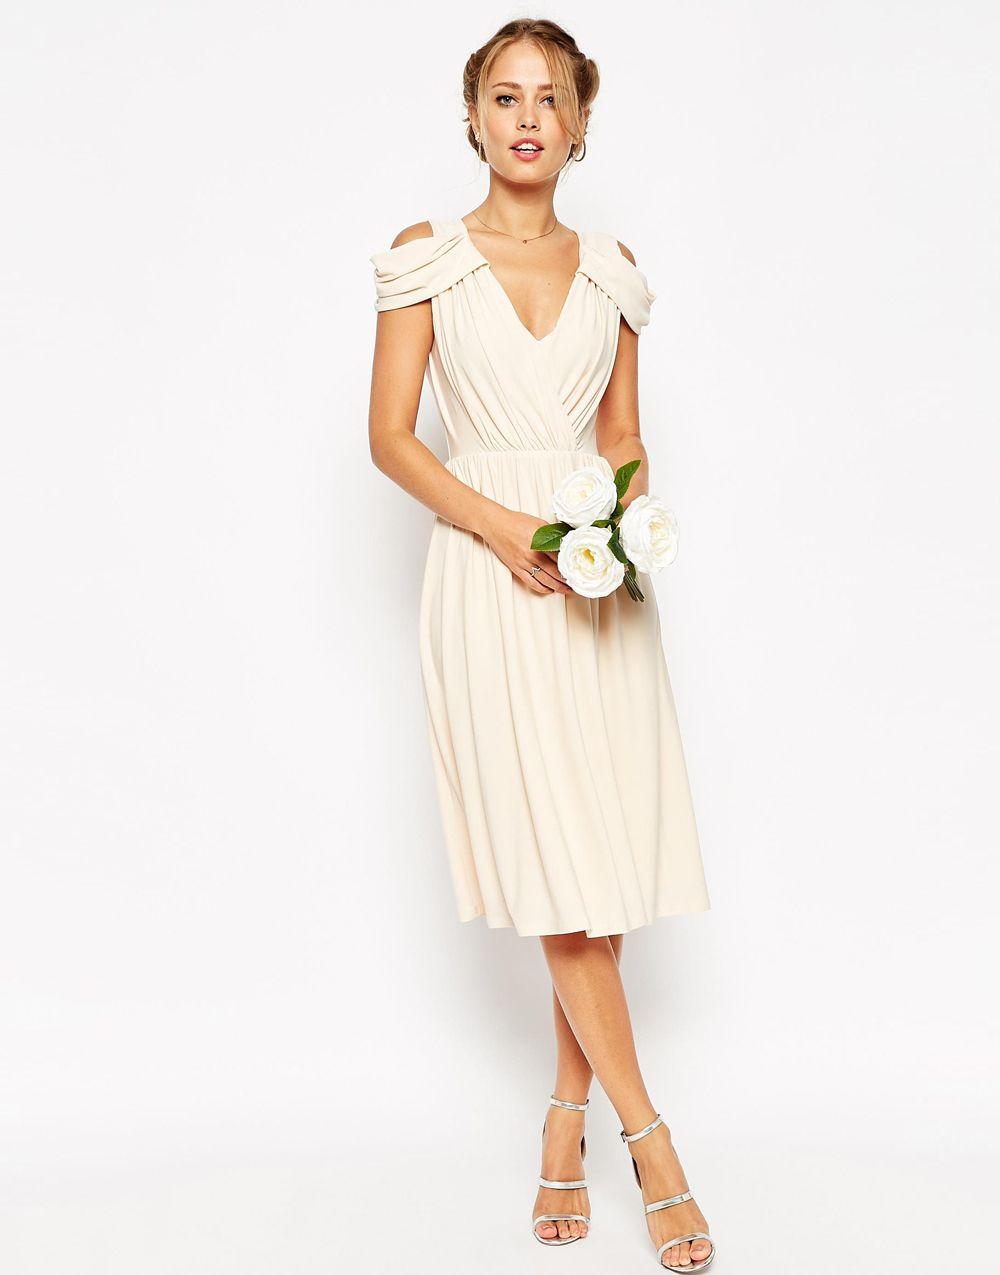 Cheap Wedding Dresses The 47 Best Wedding Dresses On The High Street High Street Bridesmaid Dresses Grecian Wedding Dress Affordable Bridesmaid Dresses